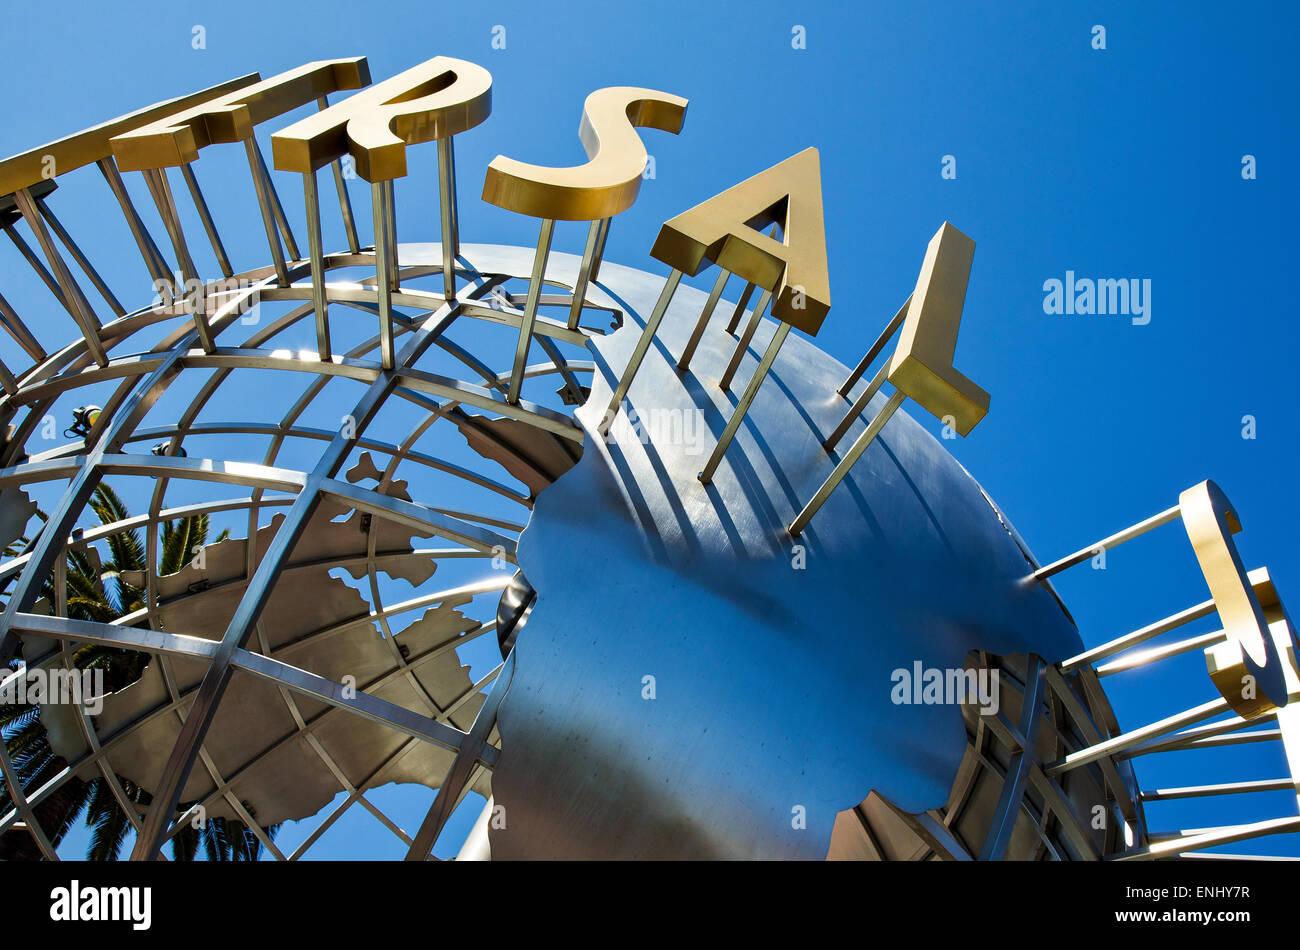 U.S.A., California, Los Angeles, Hollywood, the Universal Studios entrance - Stock Image